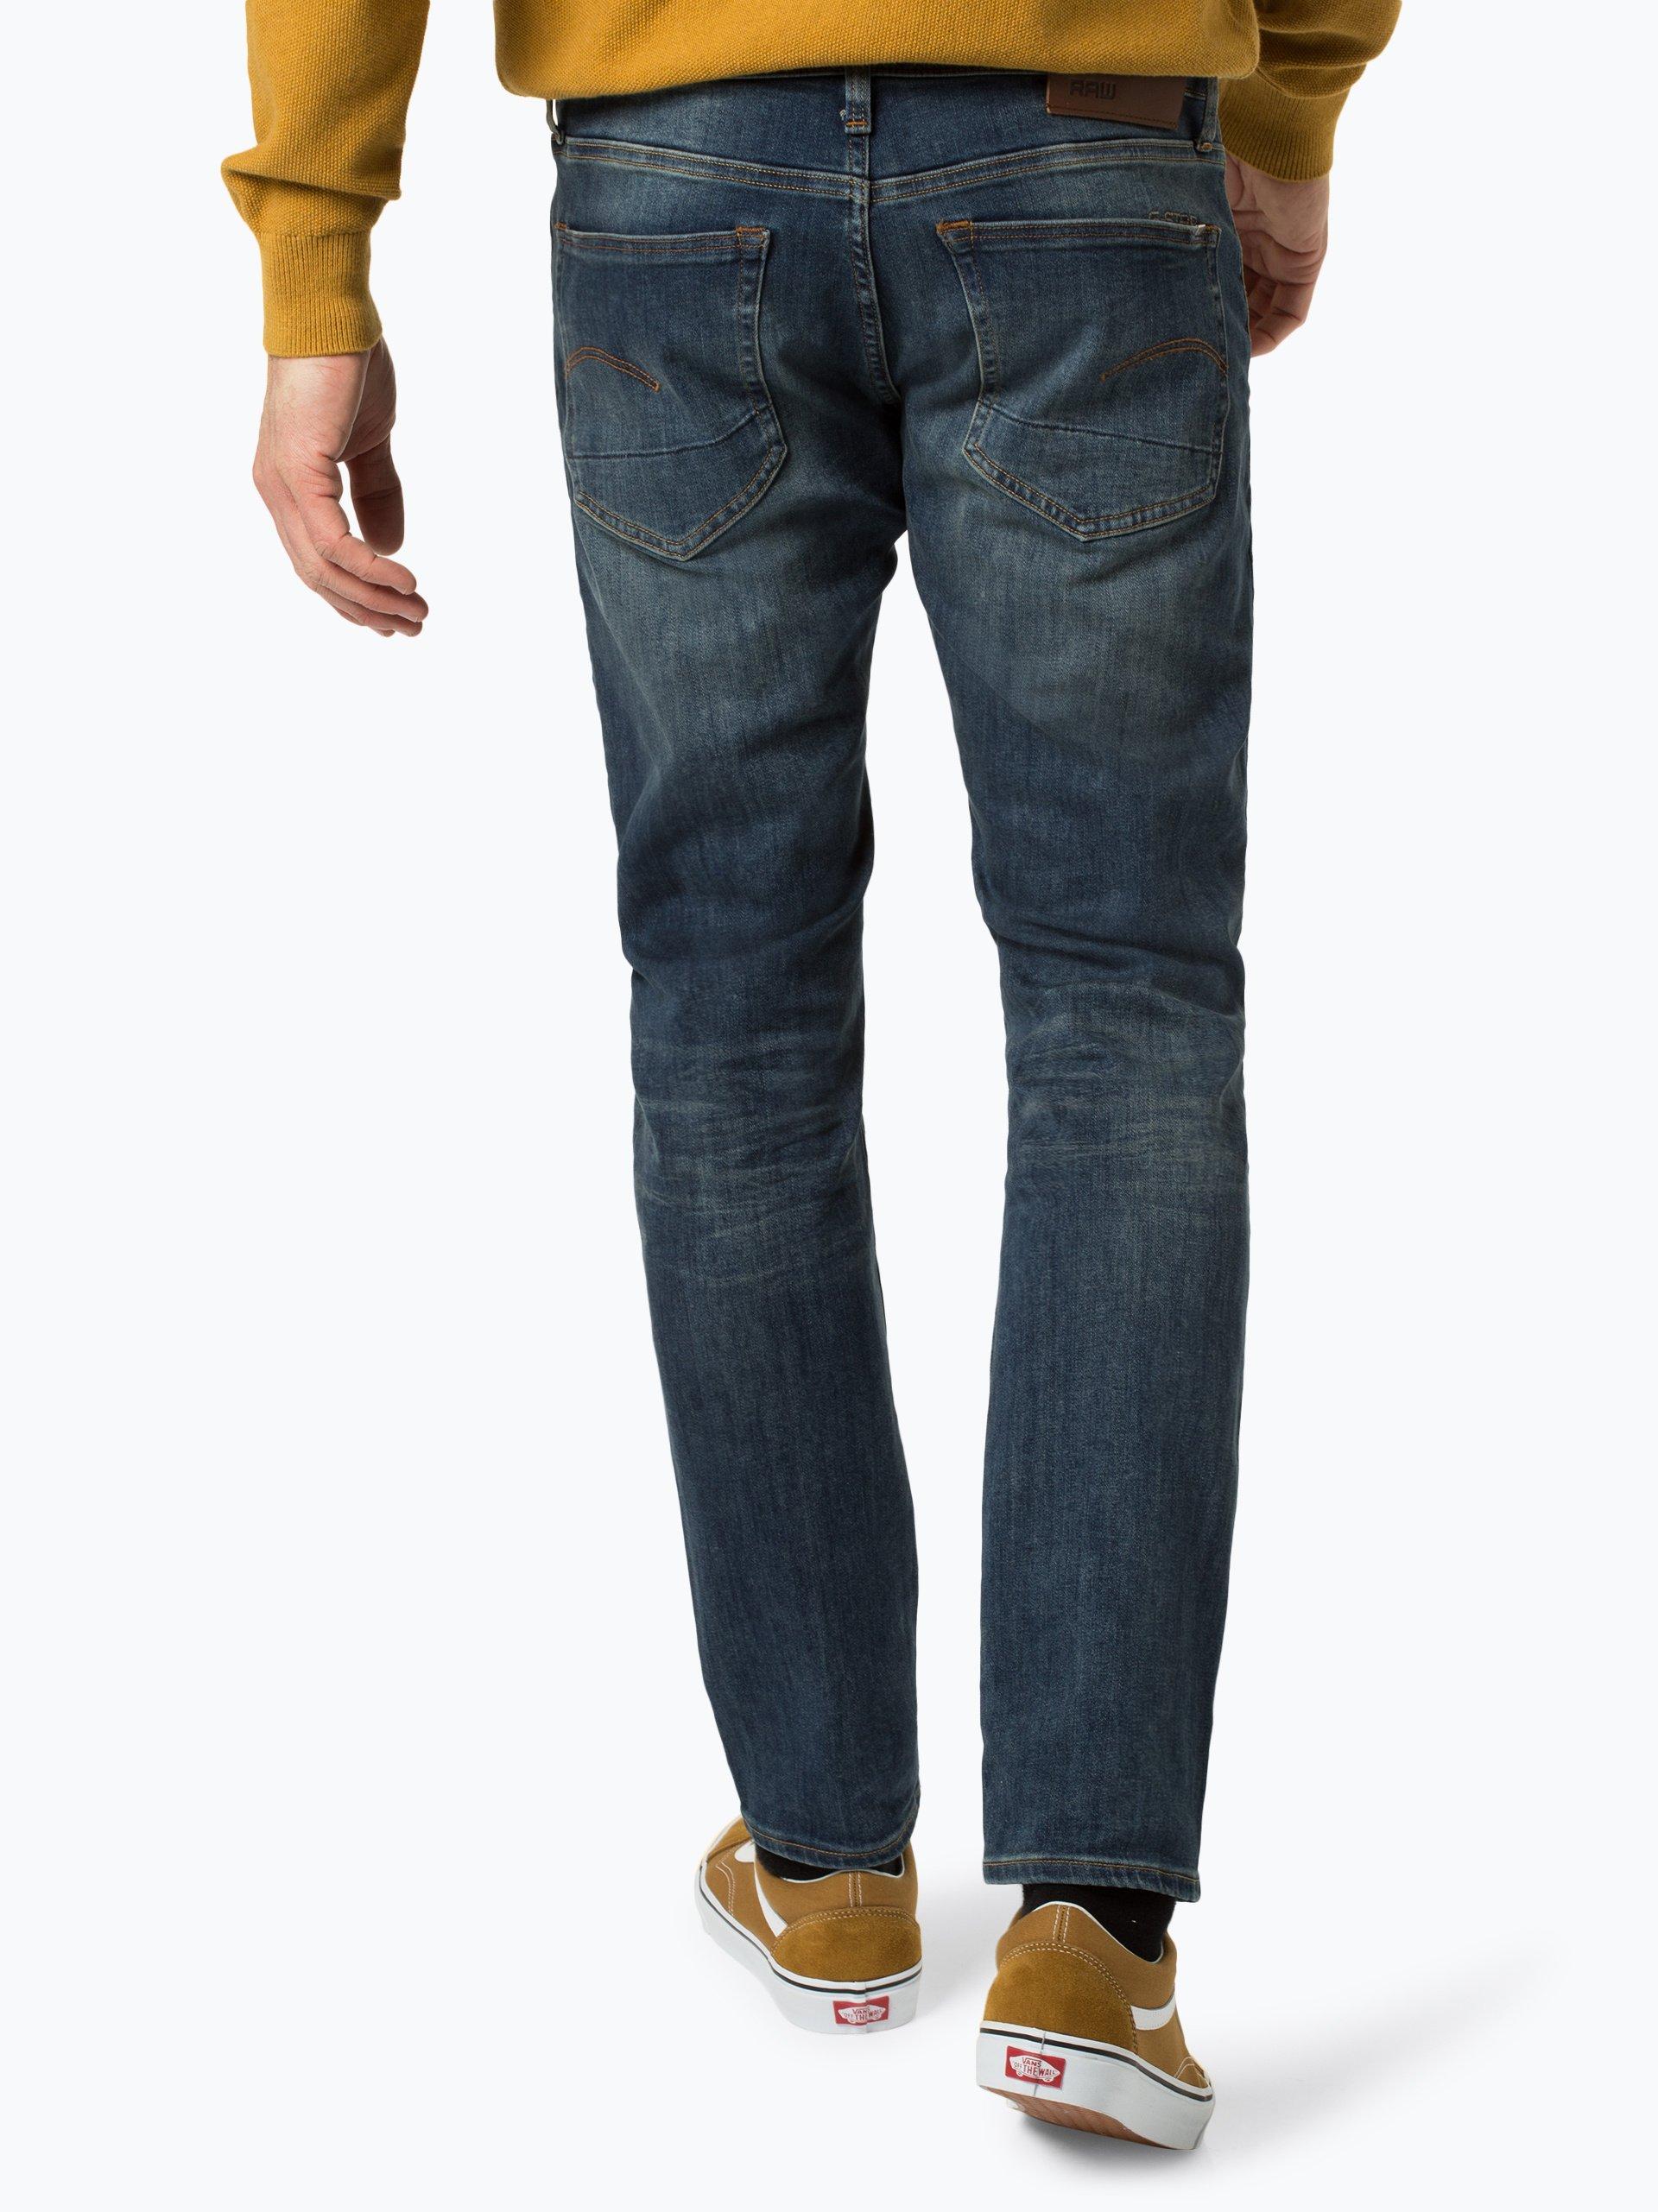 G-Star RAW Herren Jeans - 3301 Slim